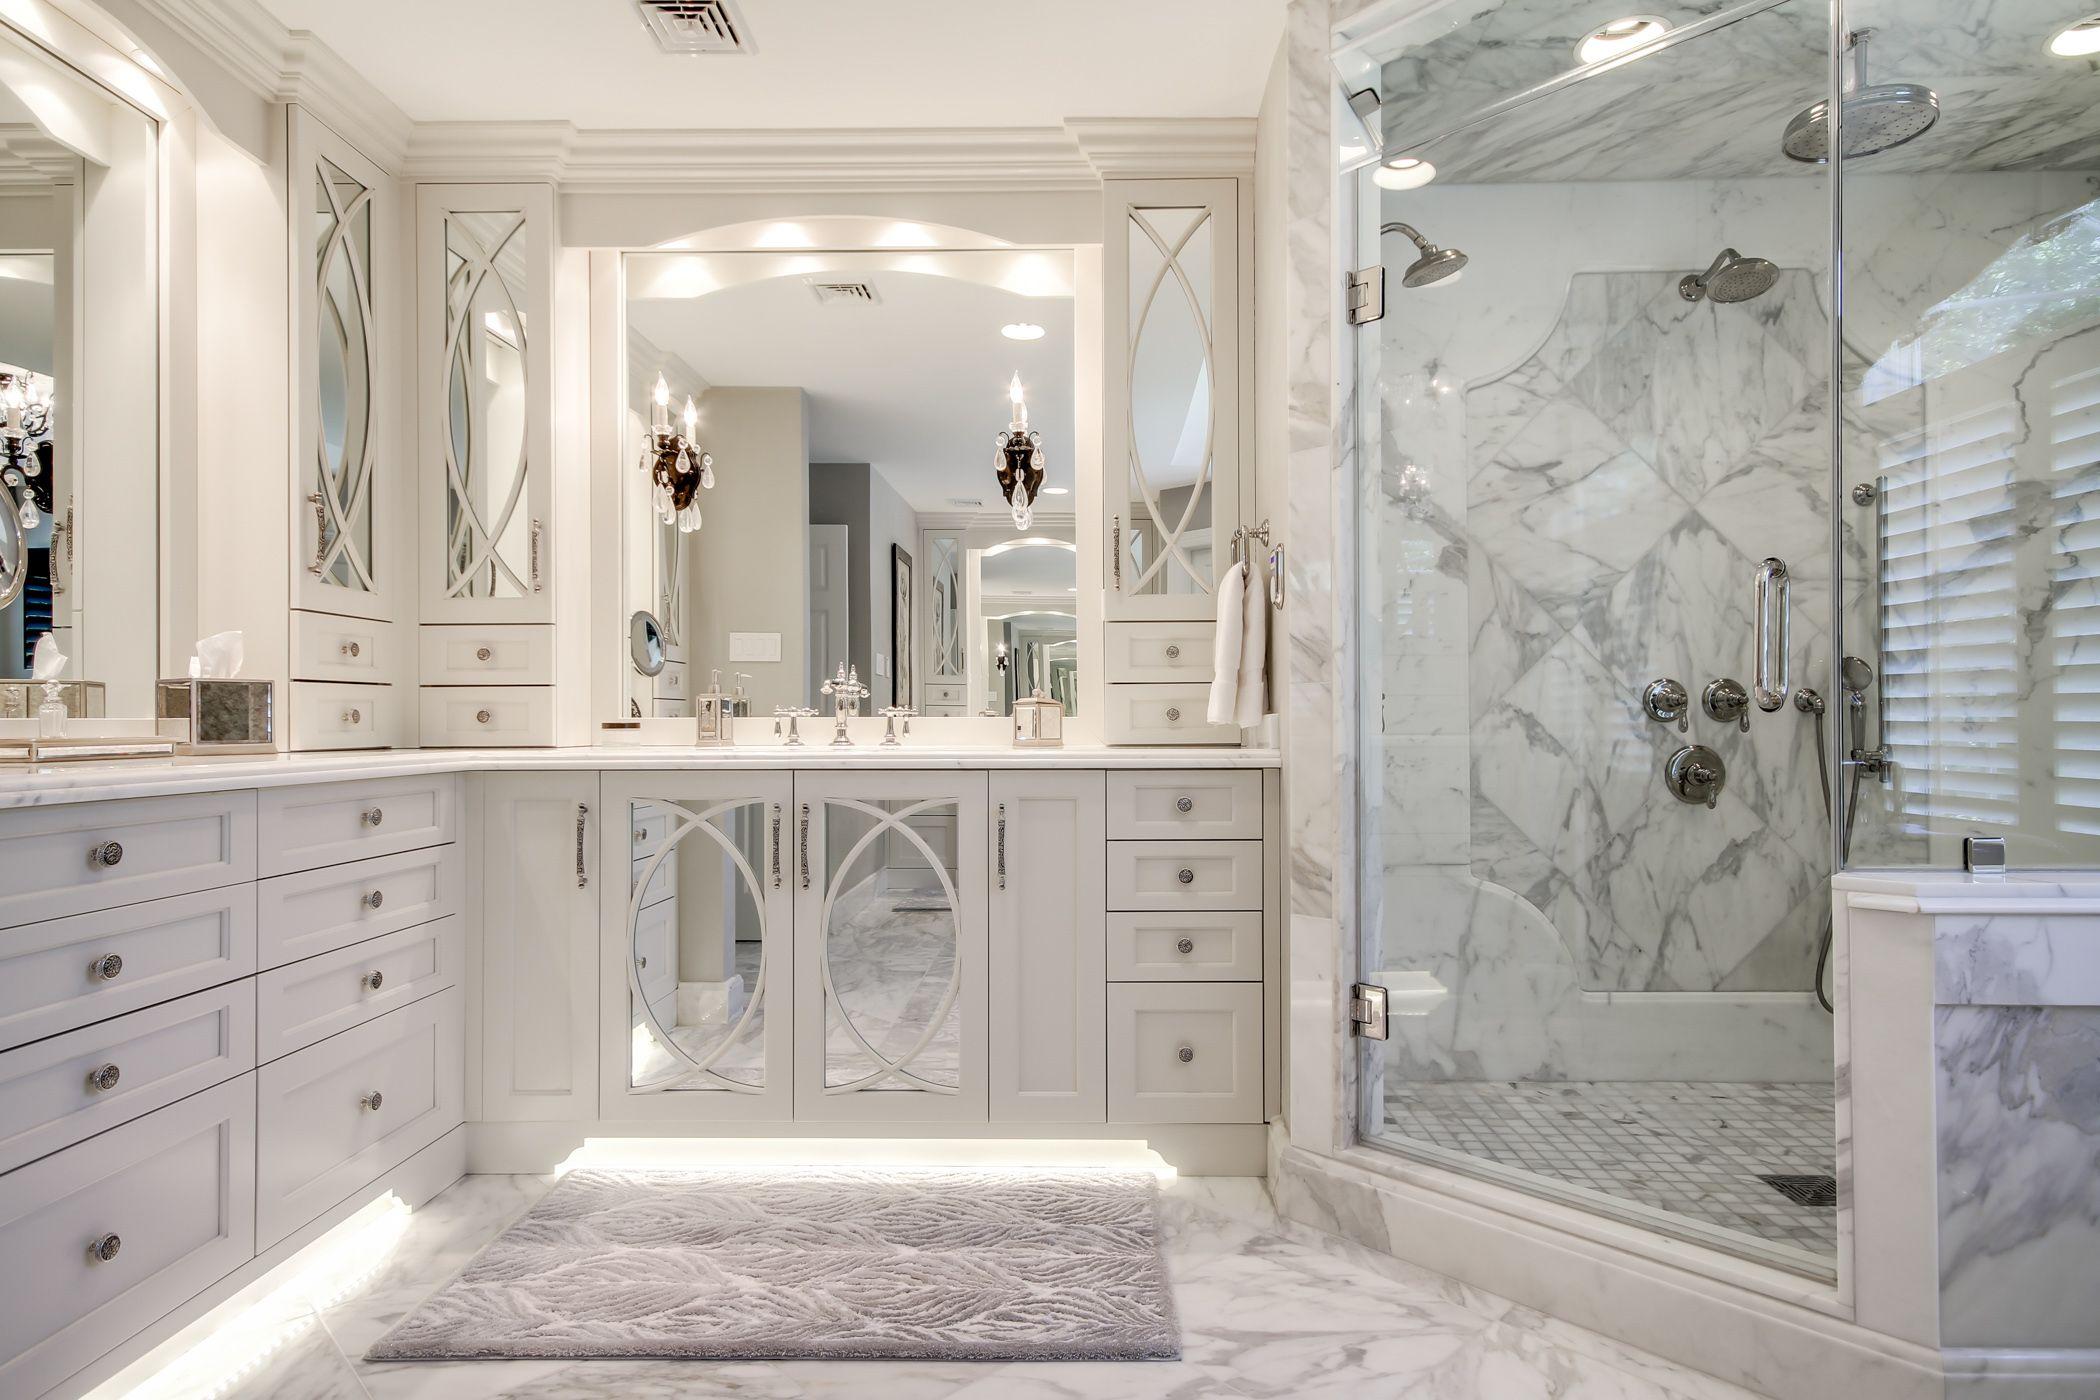 This Master Bathroom Features Gorgeous White Calacatta